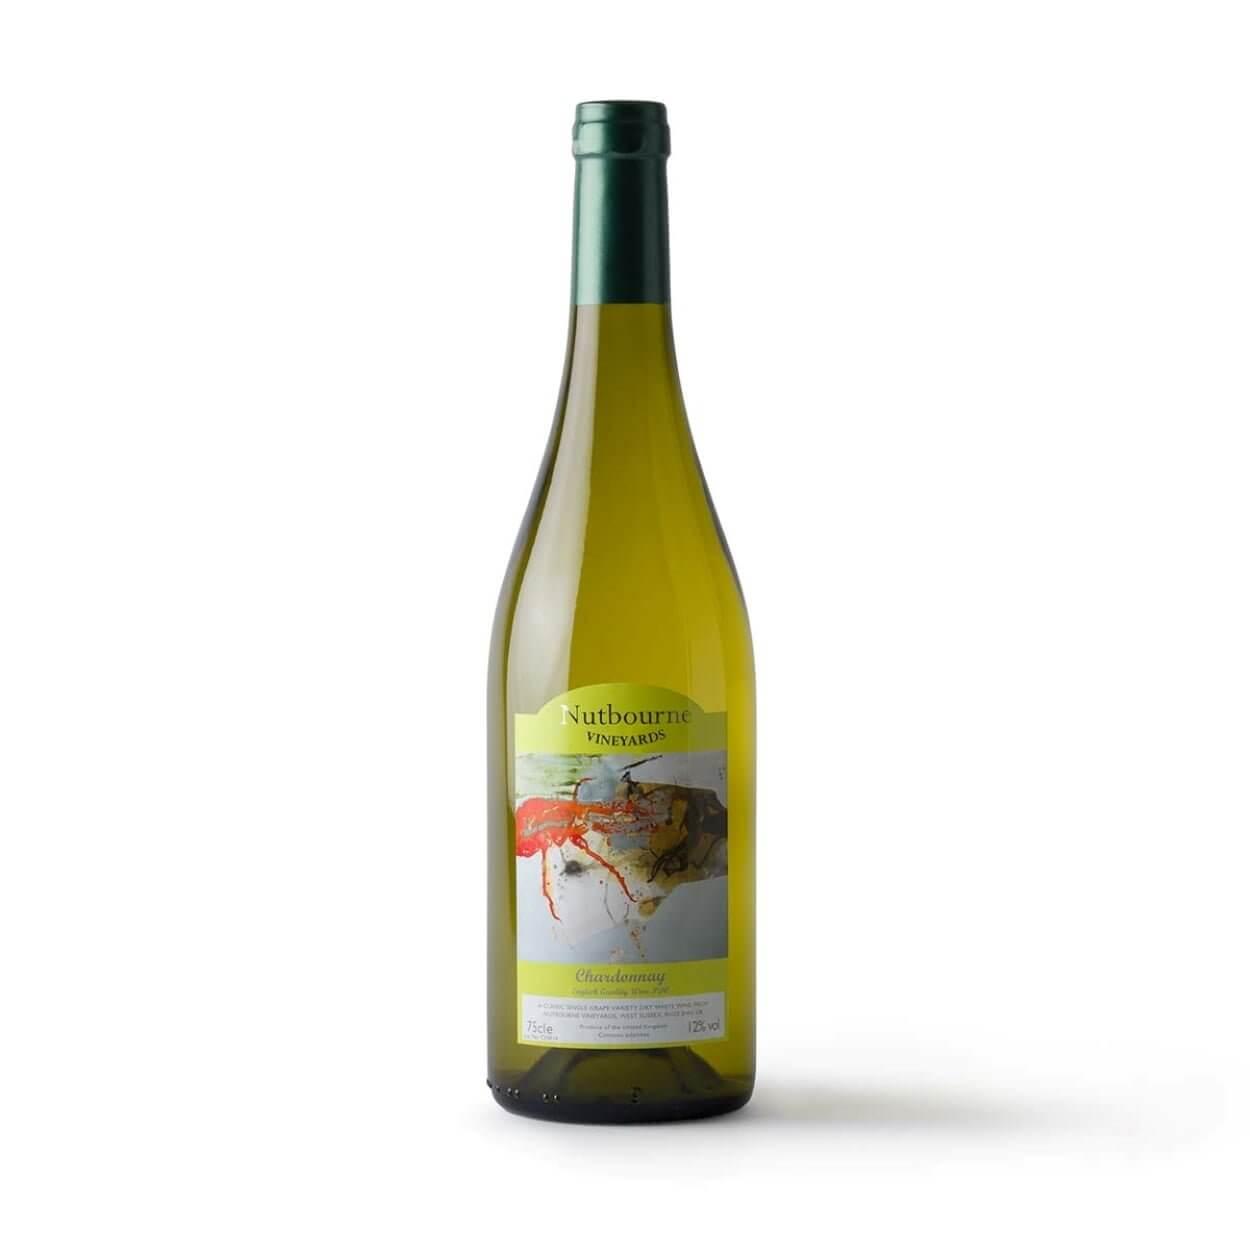 Nutbourne Vineyards Chardonnay 2014 English wine